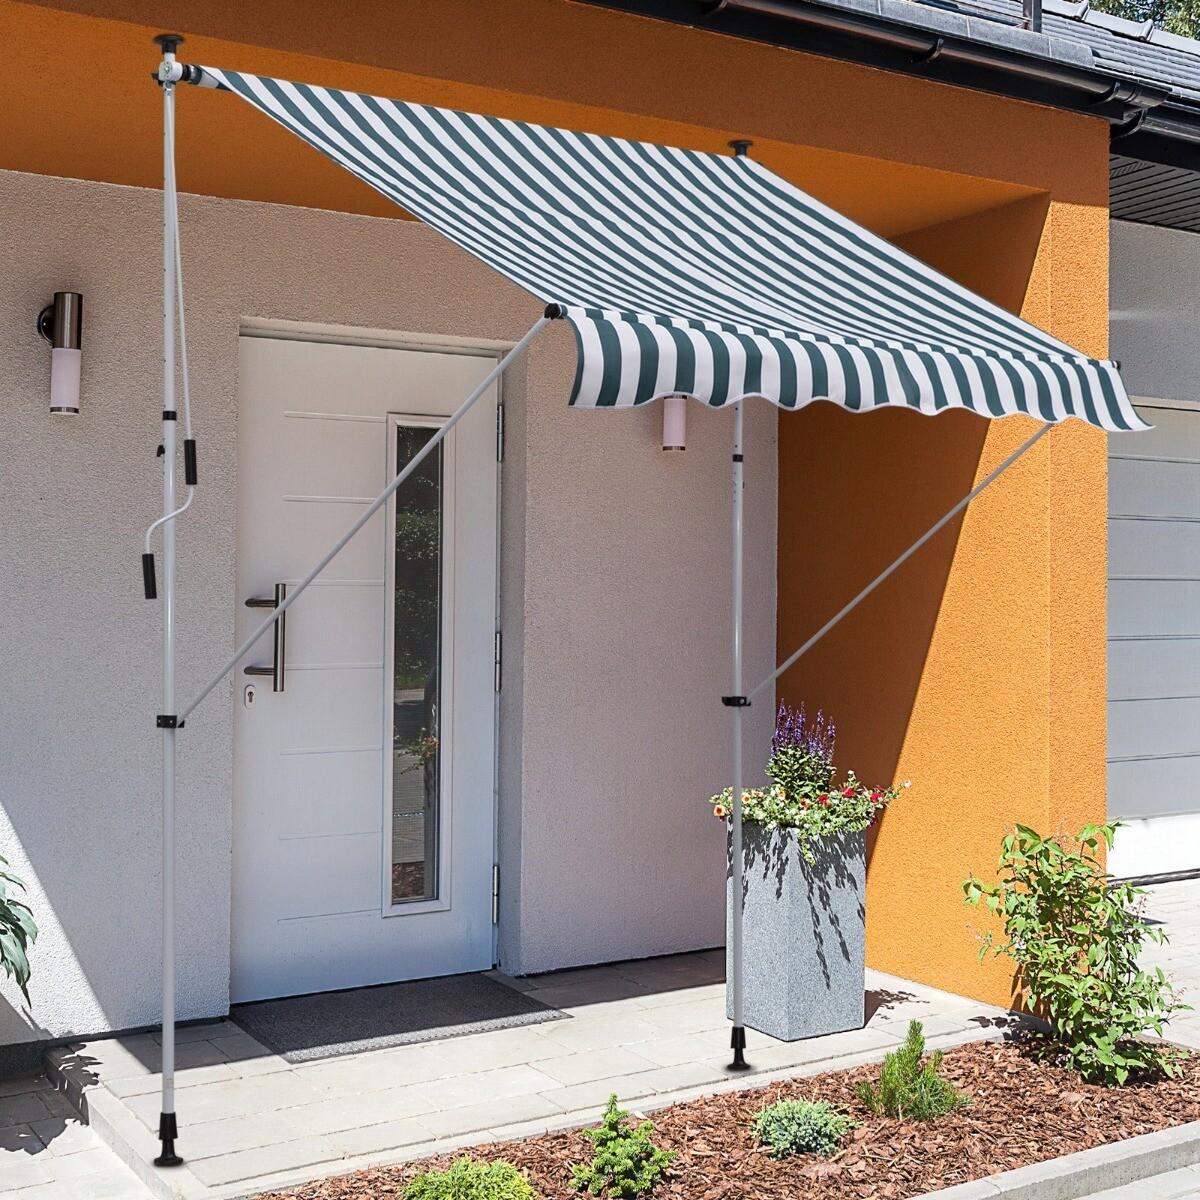 Outsunny® Sonnenstore Markise Klemmmarkise Faltarm Sonnenschutz Handkurbel Balkon Alu 2x1,5m Grün